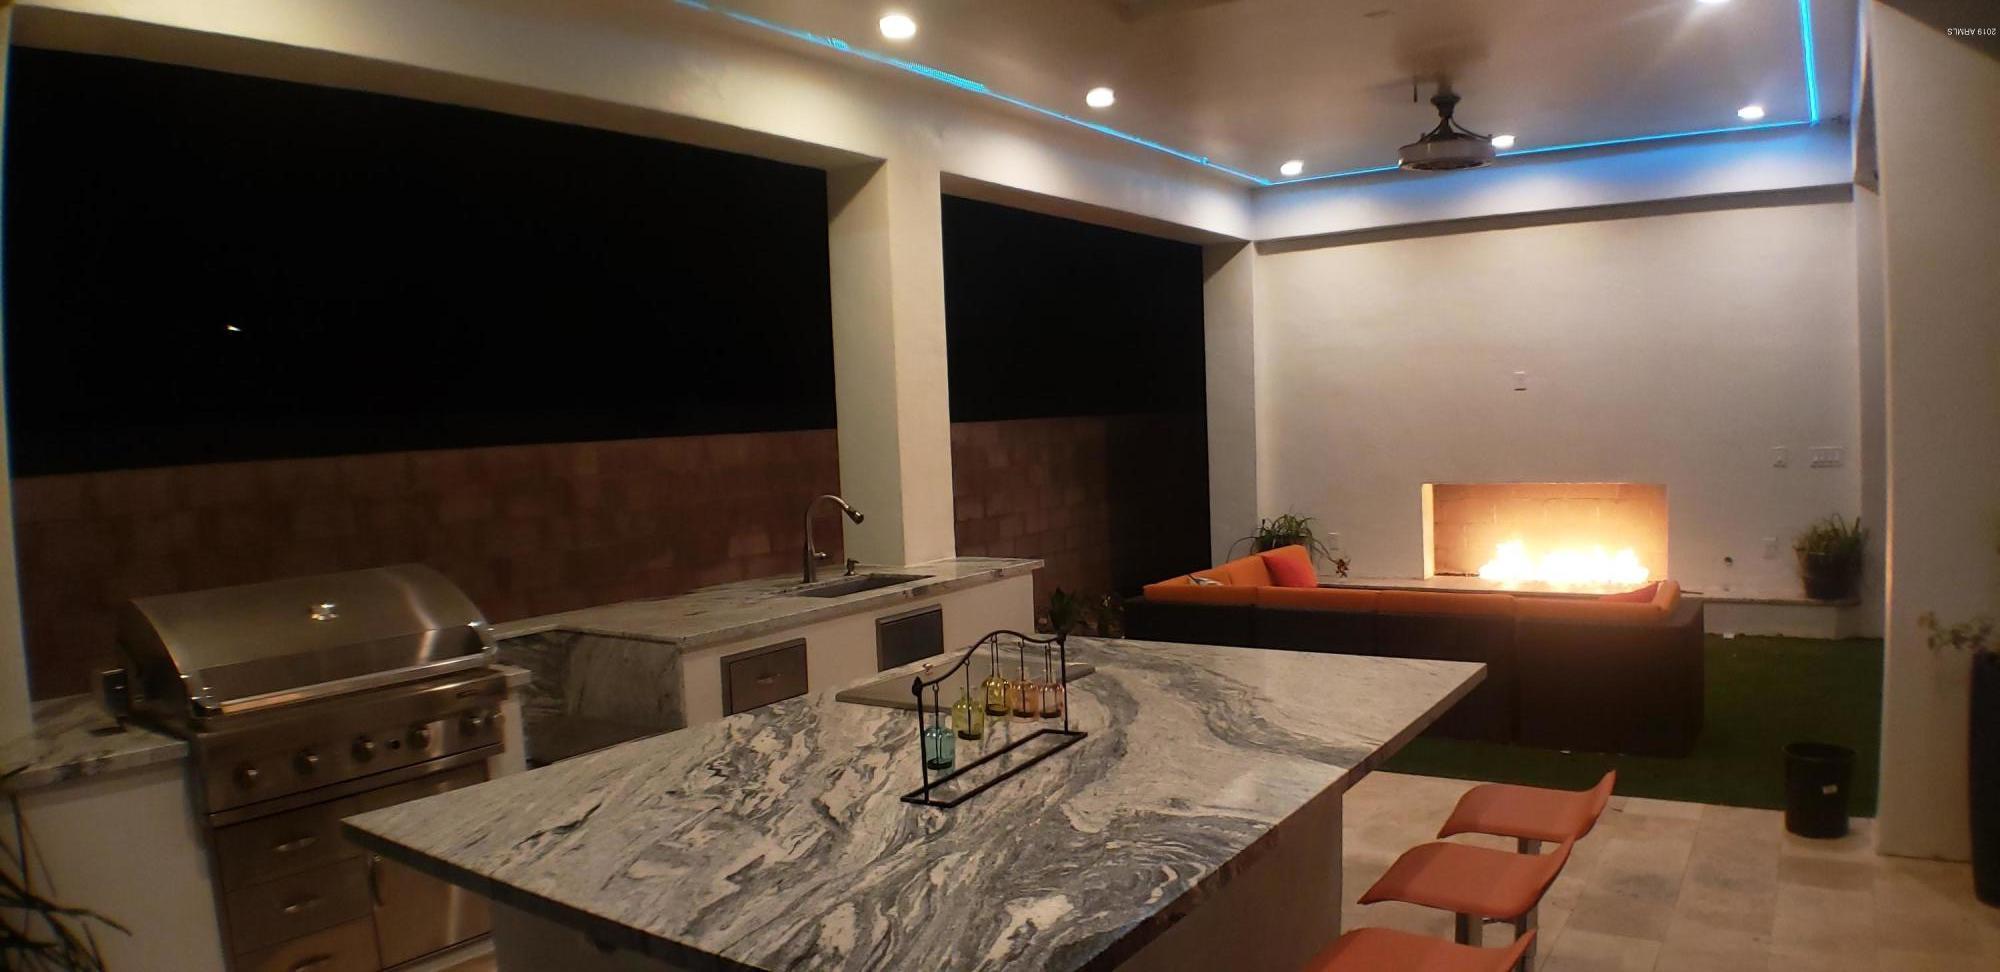 MLS 5954193 6201 E SWEETWATER Avenue, Scottsdale, AZ 85254 Scottsdale AZ Private Pool